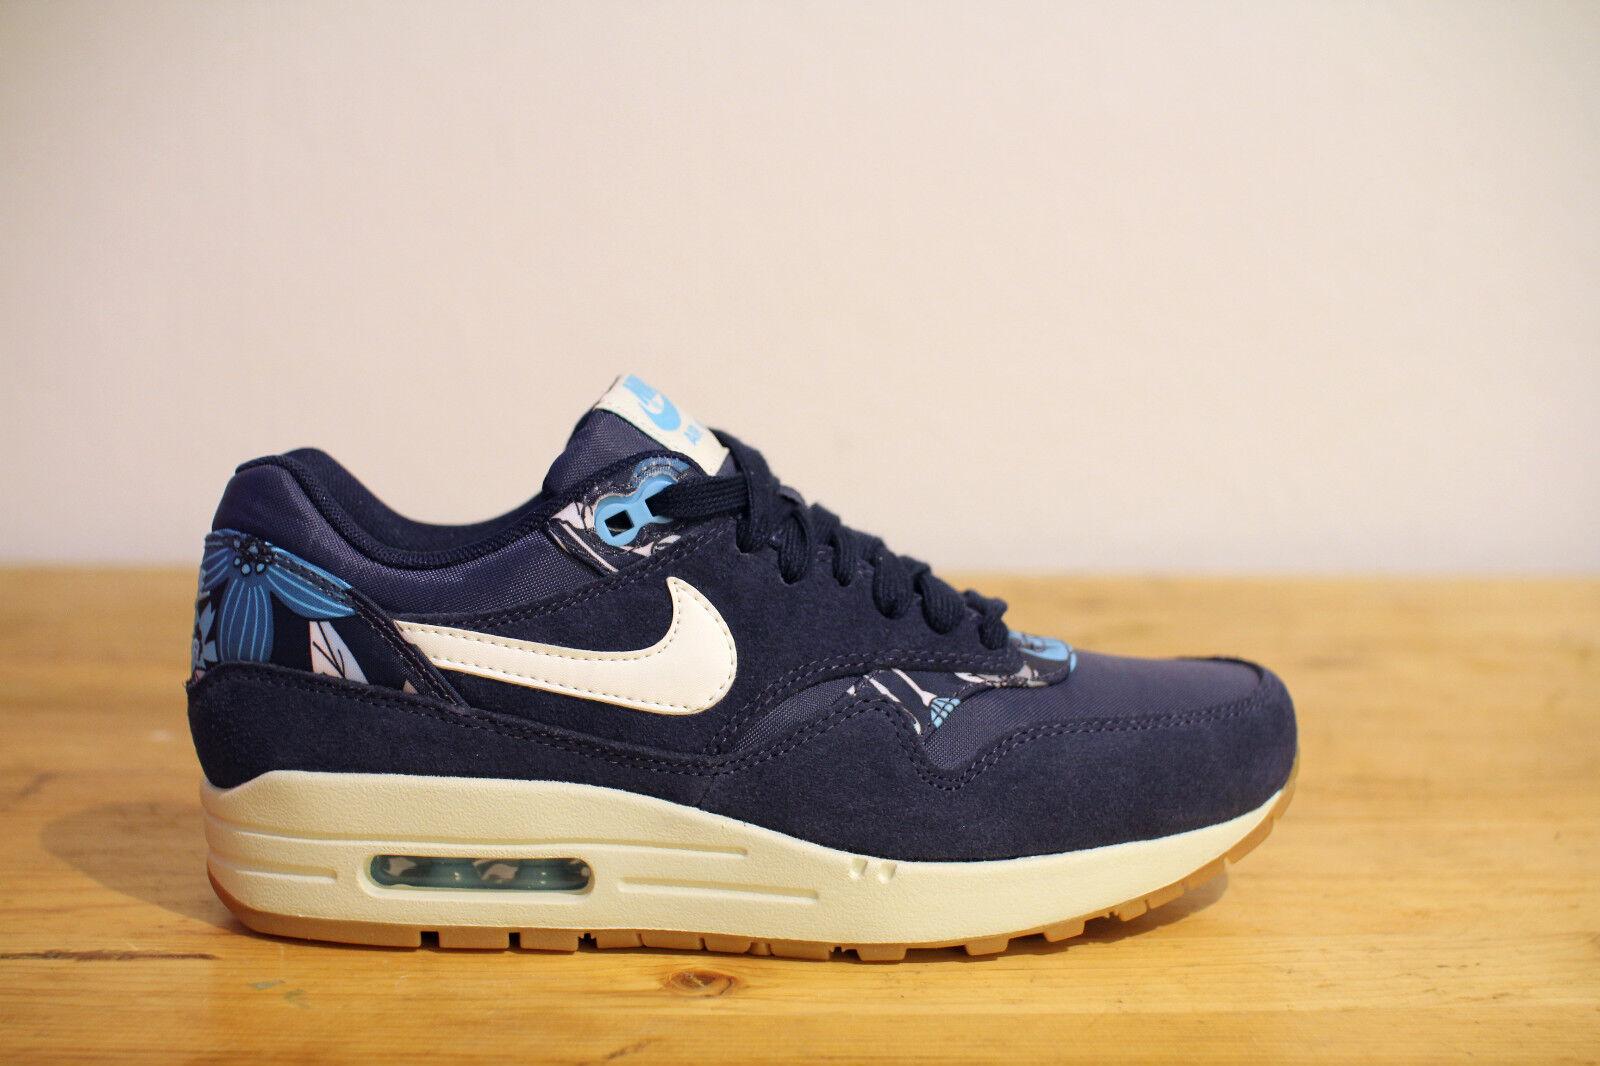 Nike Air Max 1 Floral Print blue Gr. 38 UK 4,5 NEU & OVP